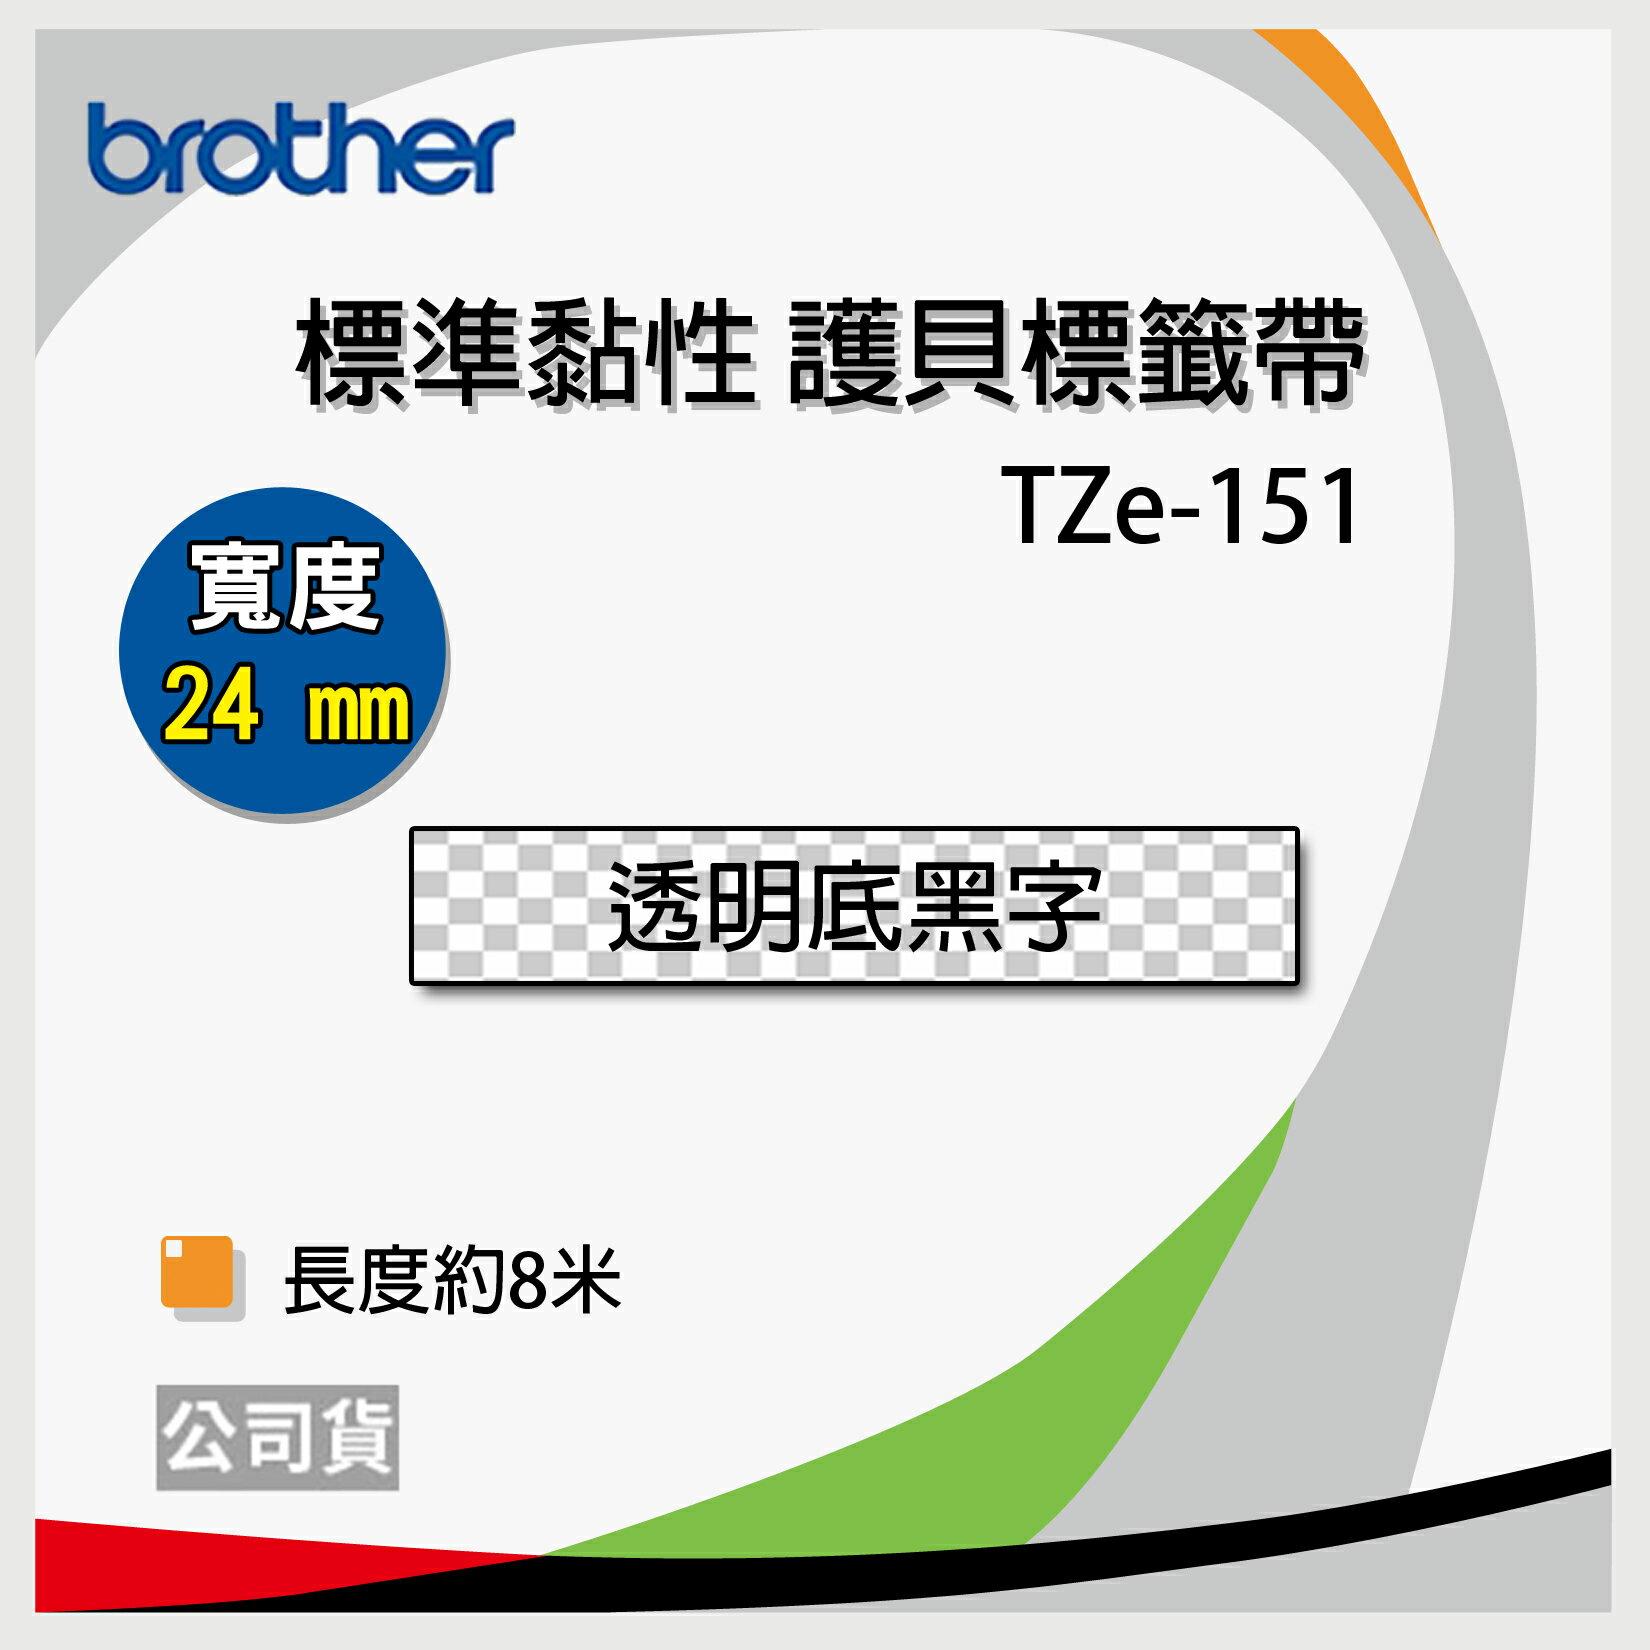 Brother 24mm 原廠護貝標籤帶系列TZ TZe-151 TZe-251 TZe-451 TZe-551 TZe-651 TZe-751